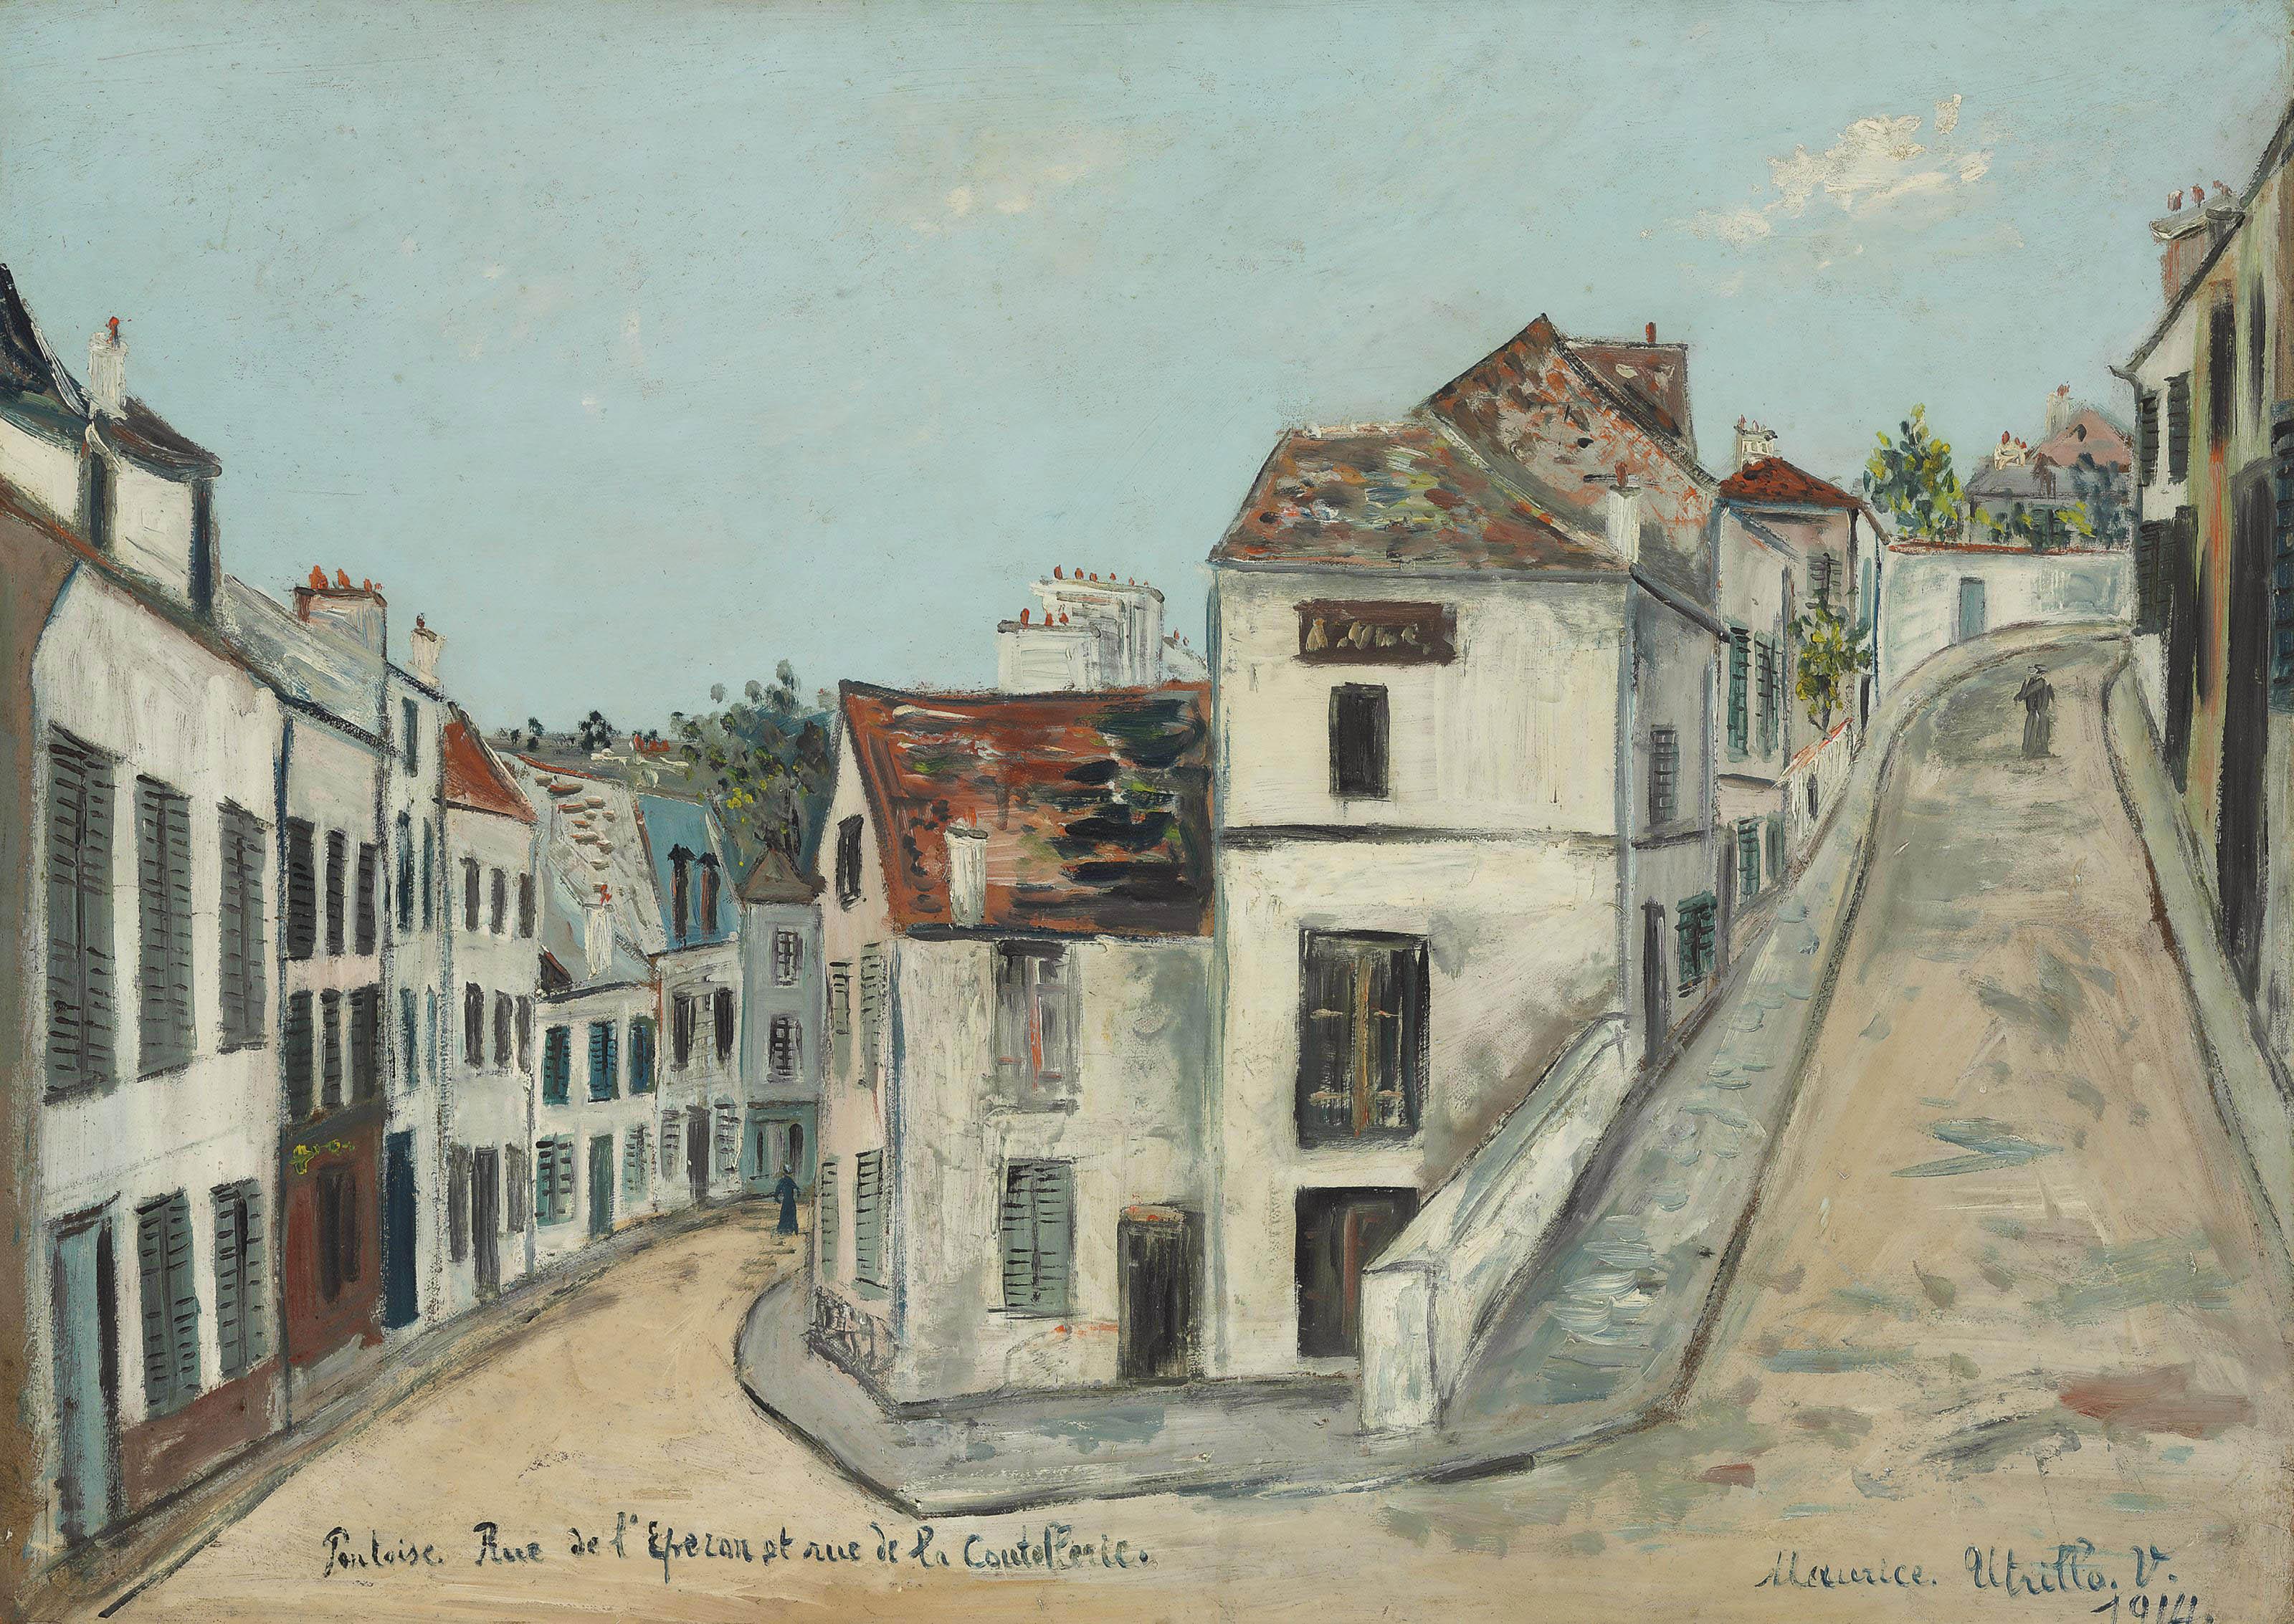 Maurice Utrillo (1883-1955)